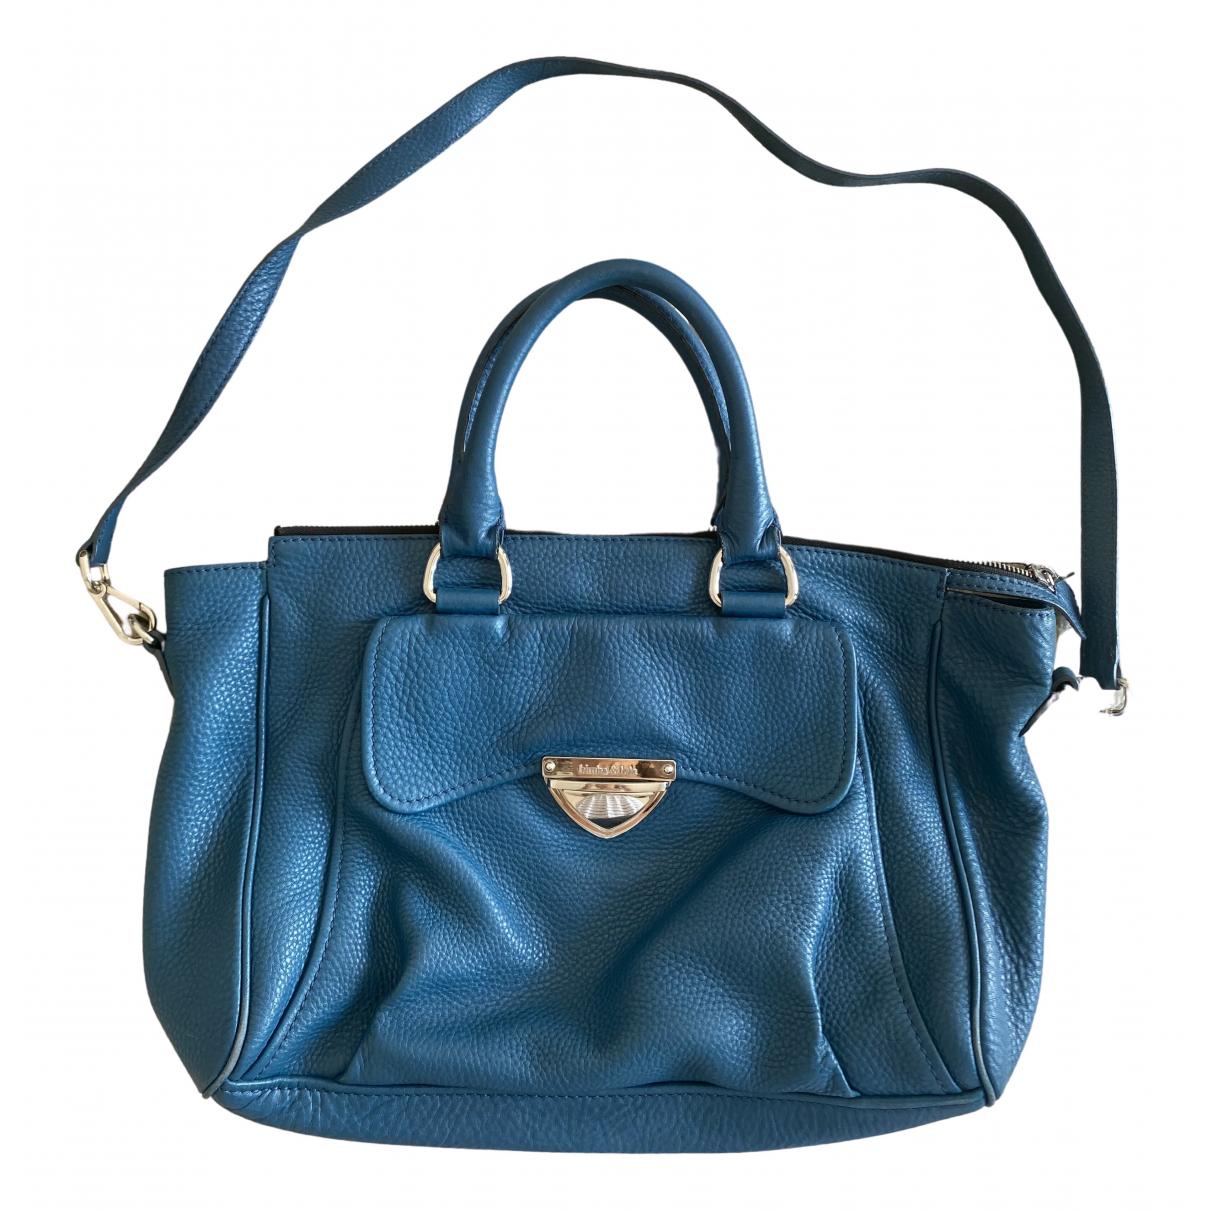 Bimba Y Lola \N Blue Leather handbag for Women \N